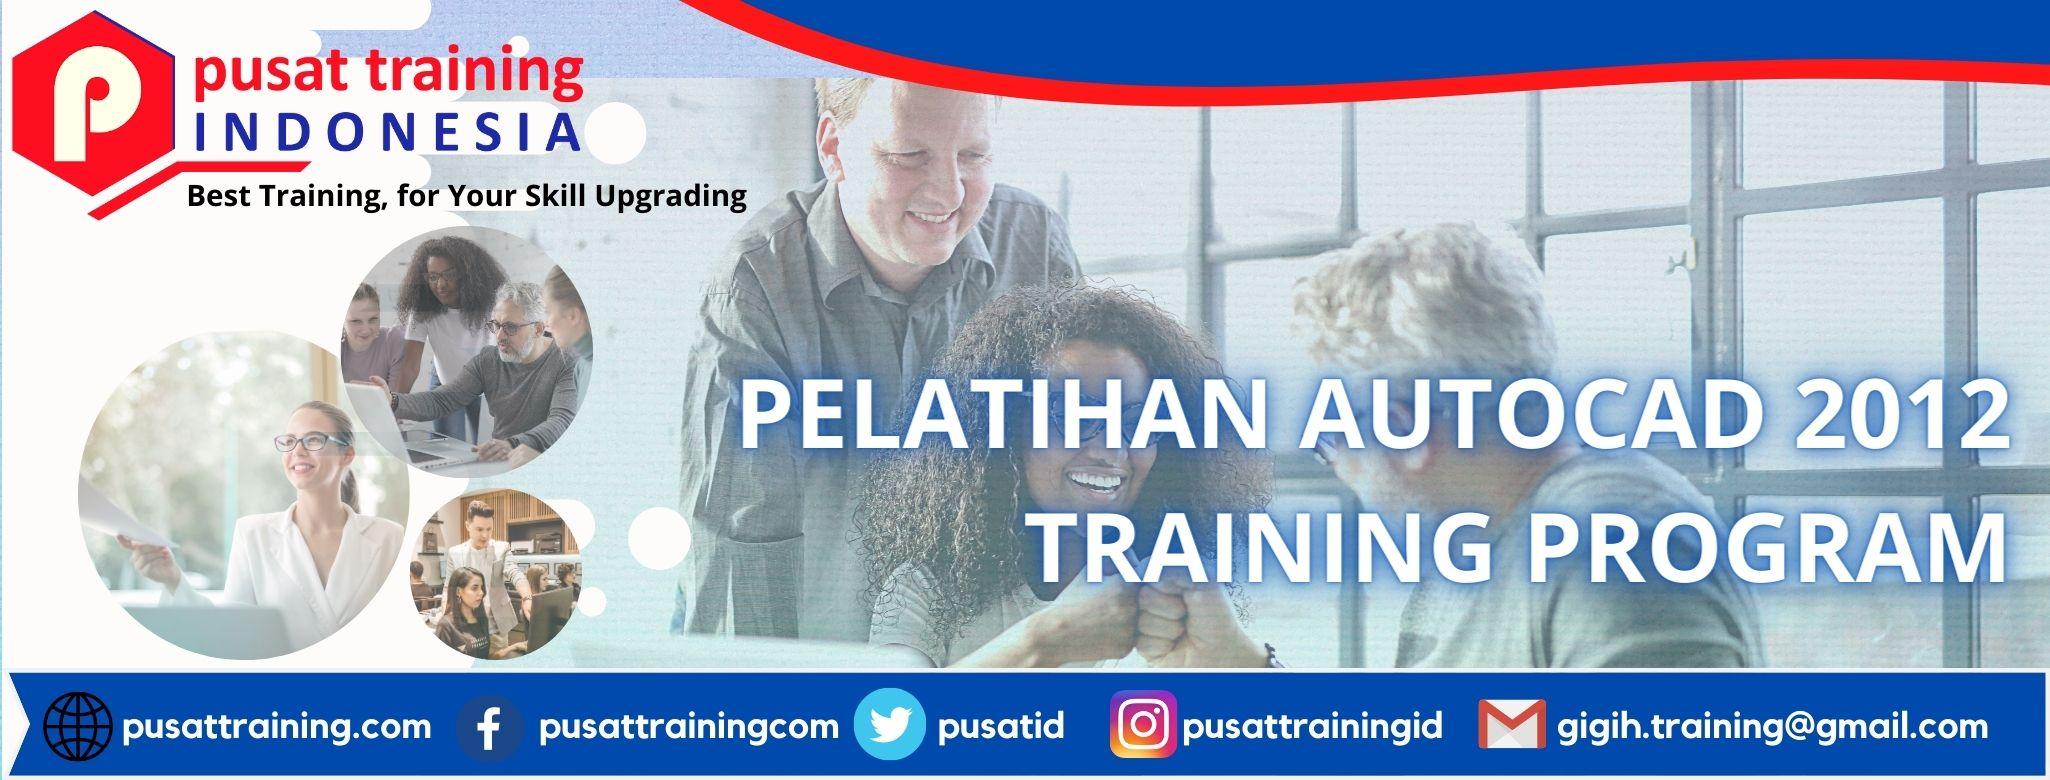 pelatihan-autocad-2012-training-program